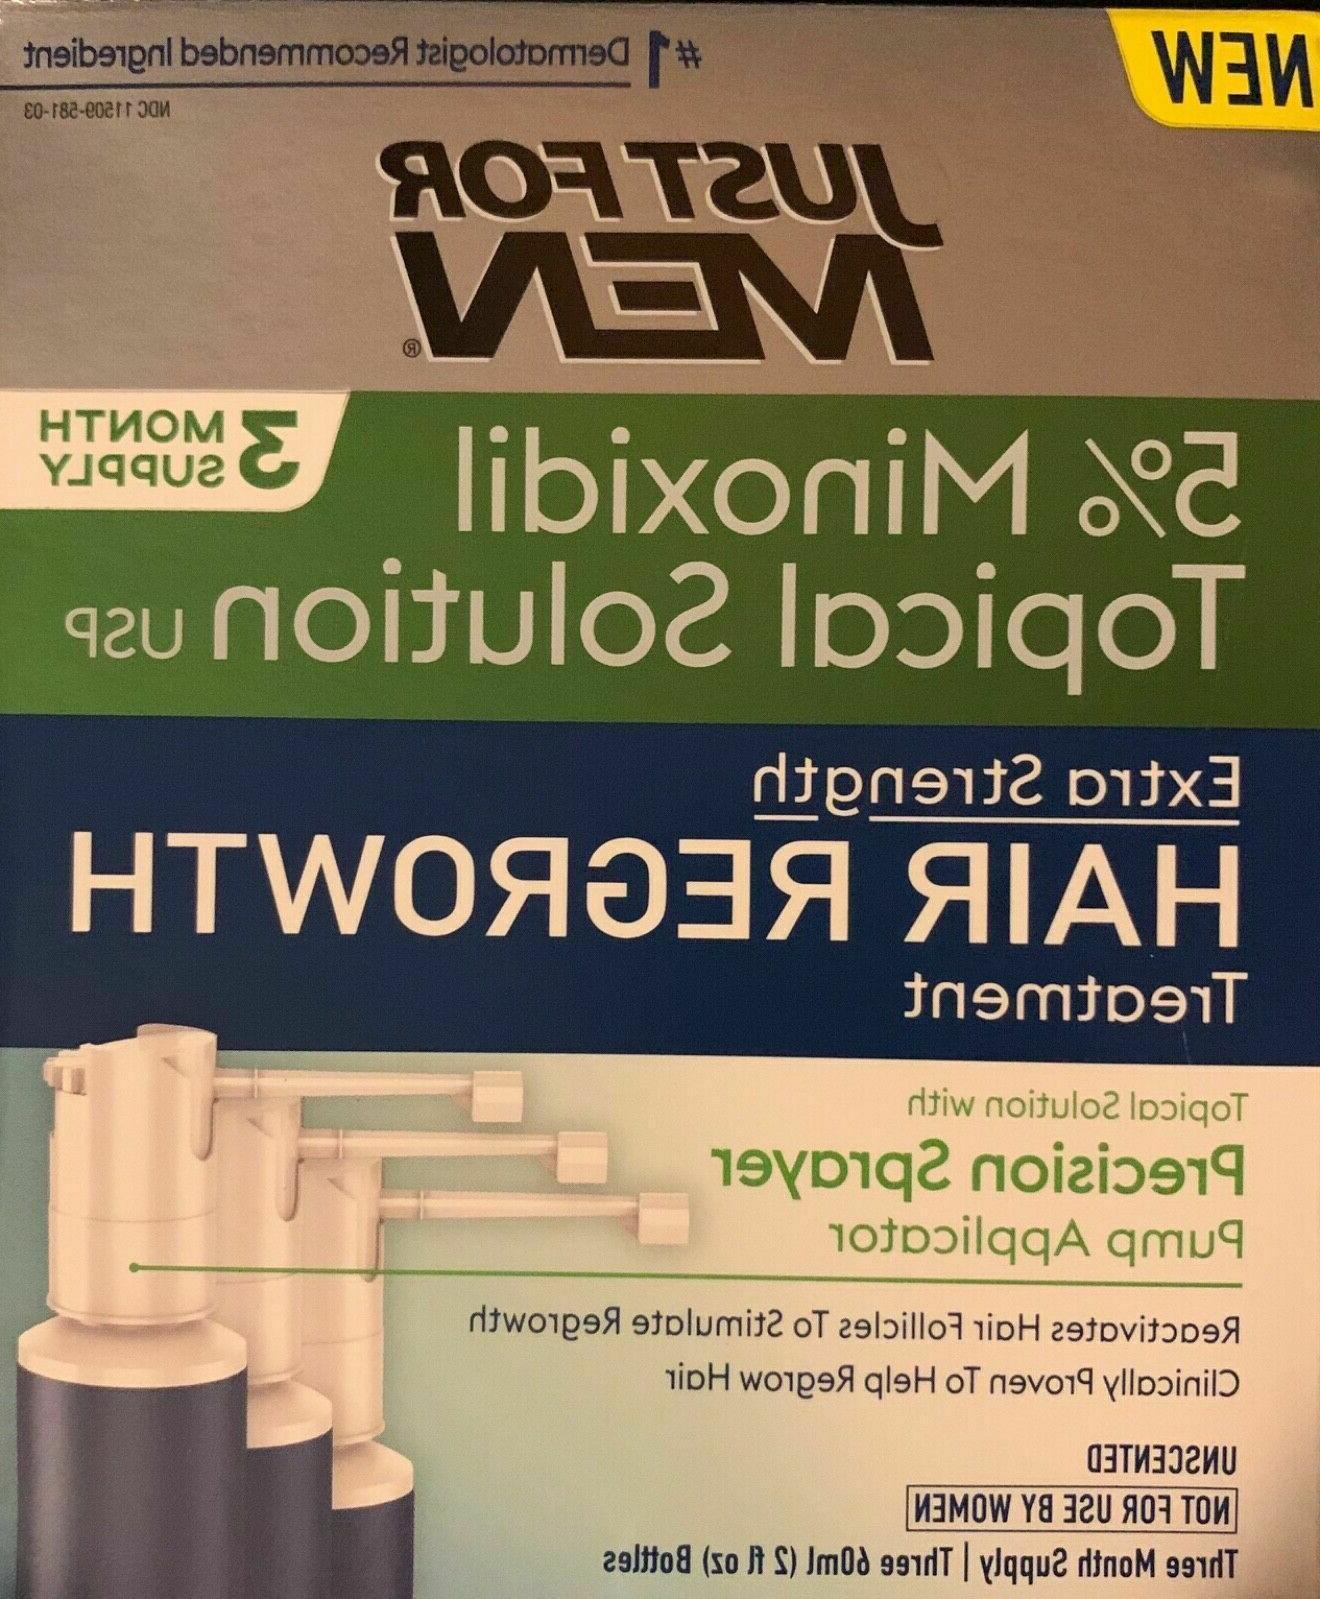 3 month hair loss treatment 5 percent